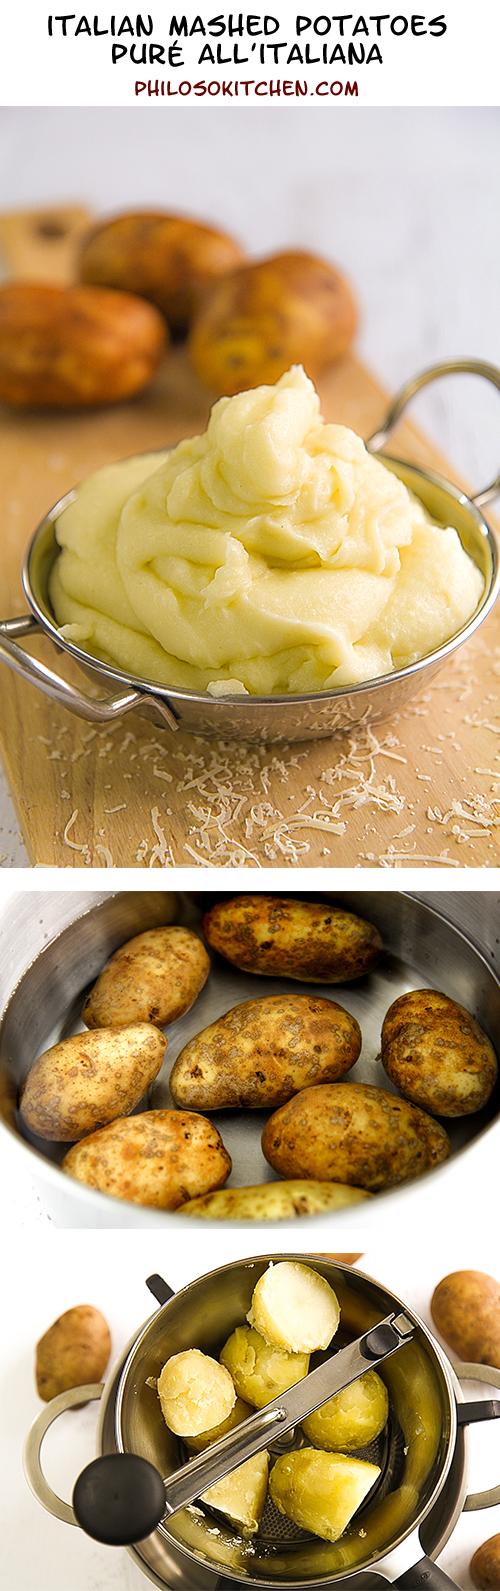 Italian mashed potatoes